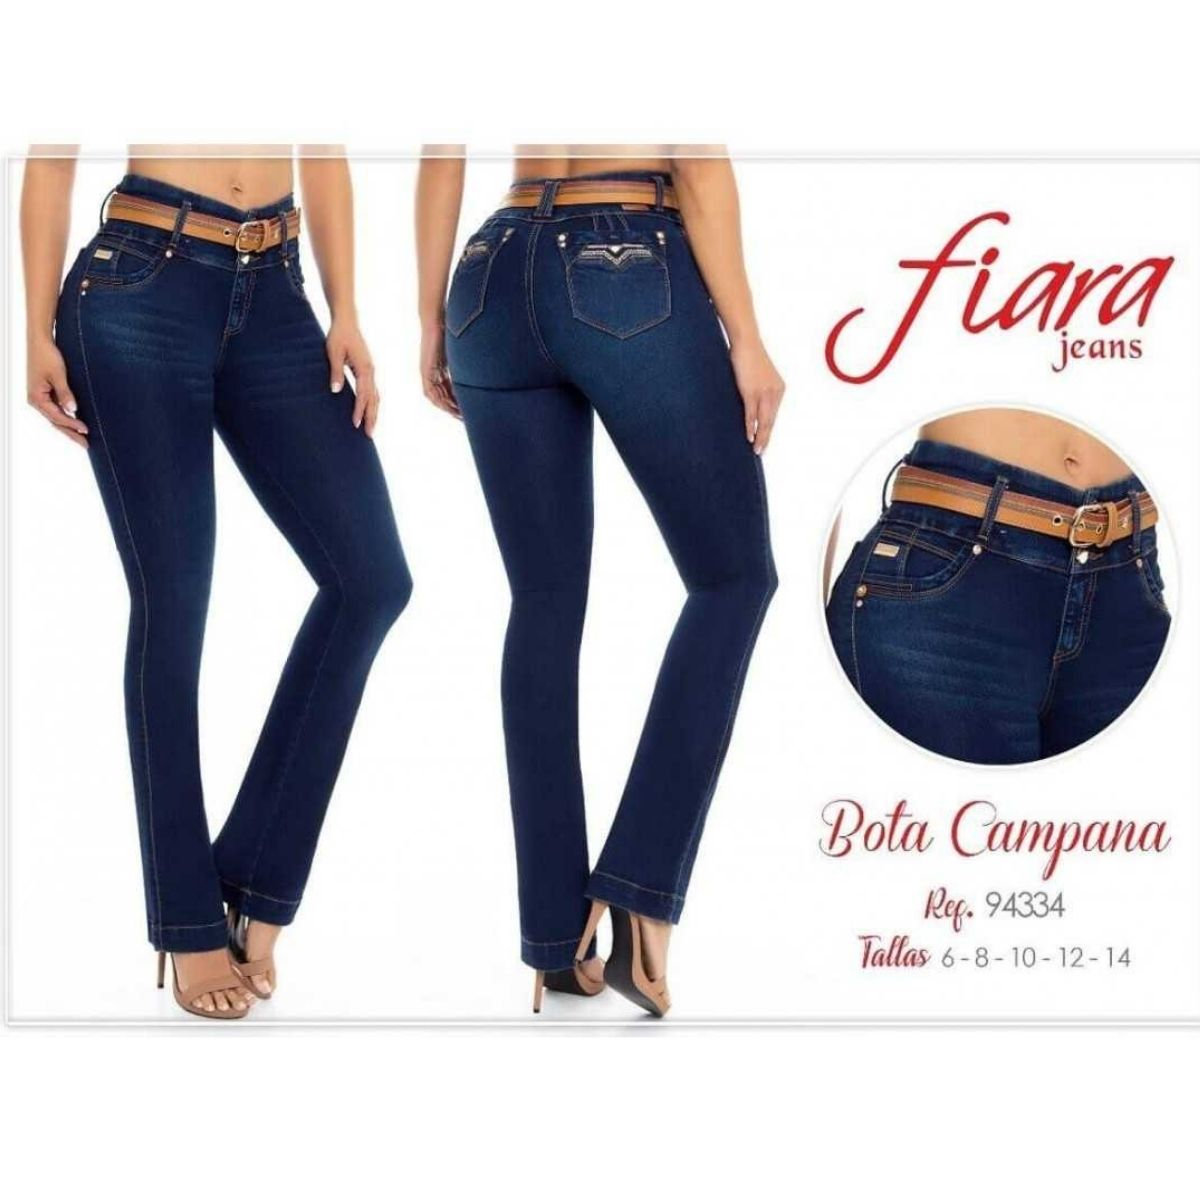 Jean Bota Campana Fiara Jeans 94334